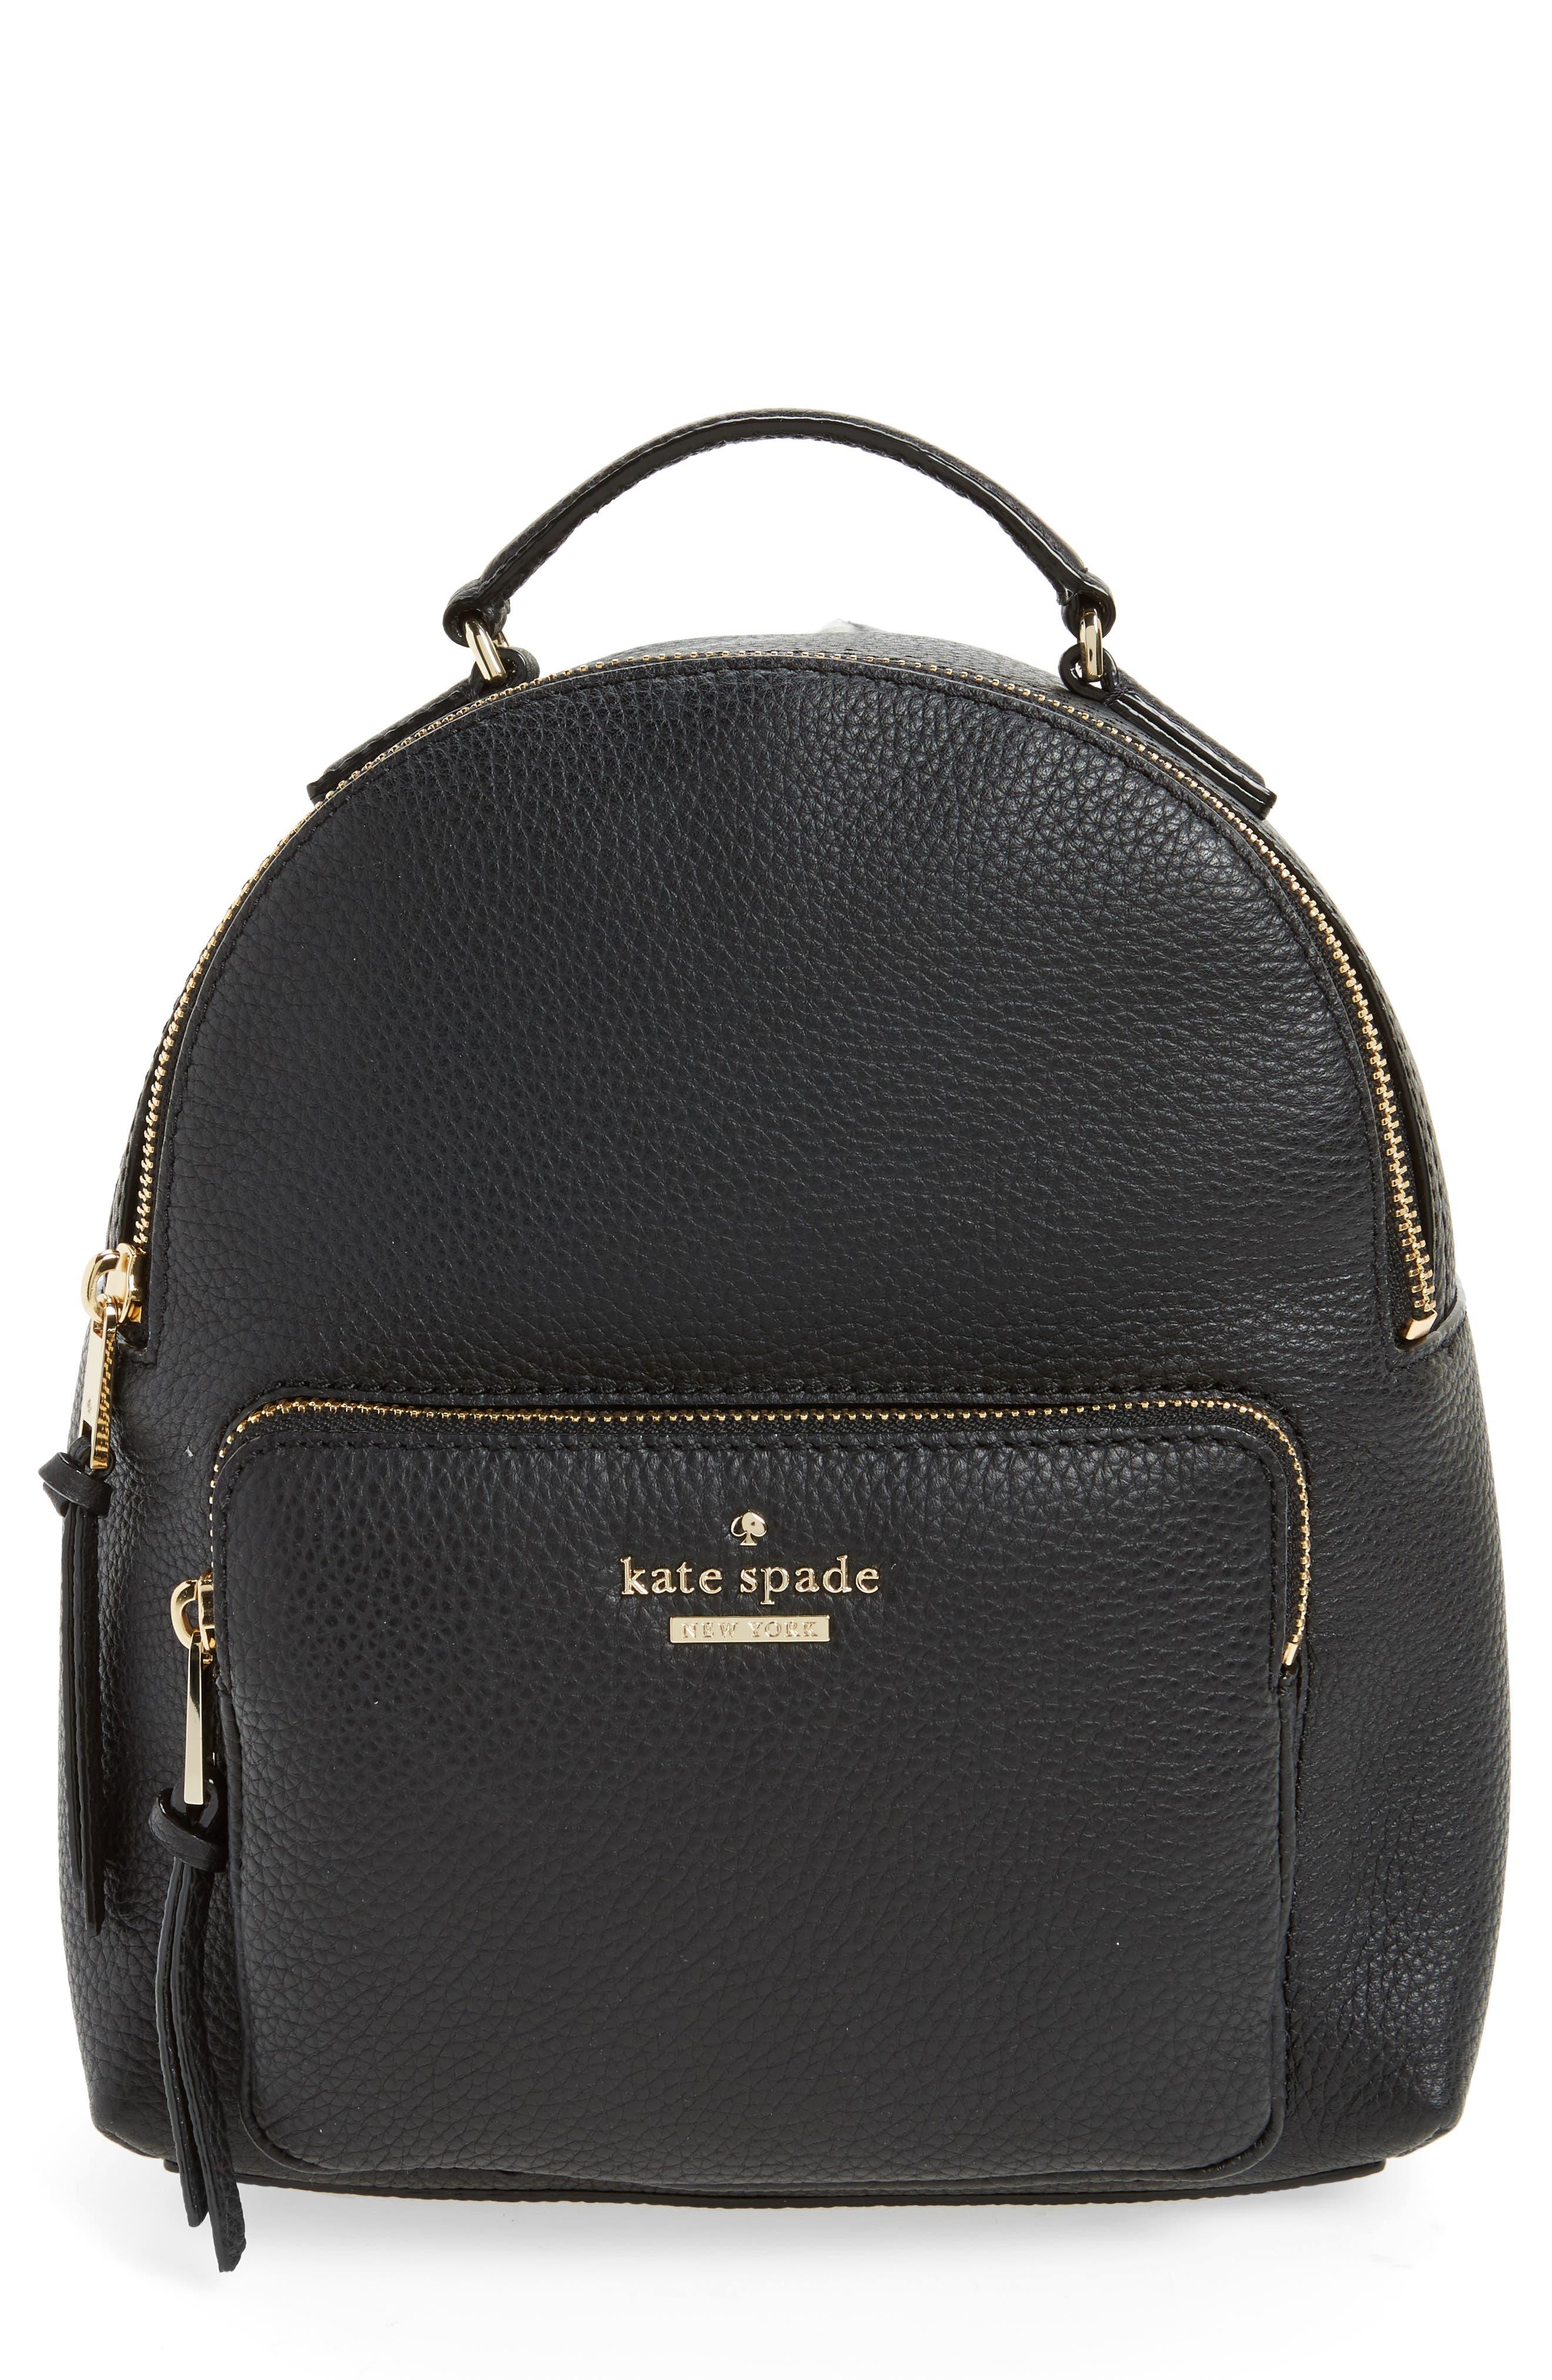 KATE SPADE NEW YORK, jackson street - keleigh leather backpack, Main thumbnail 1, color, 001